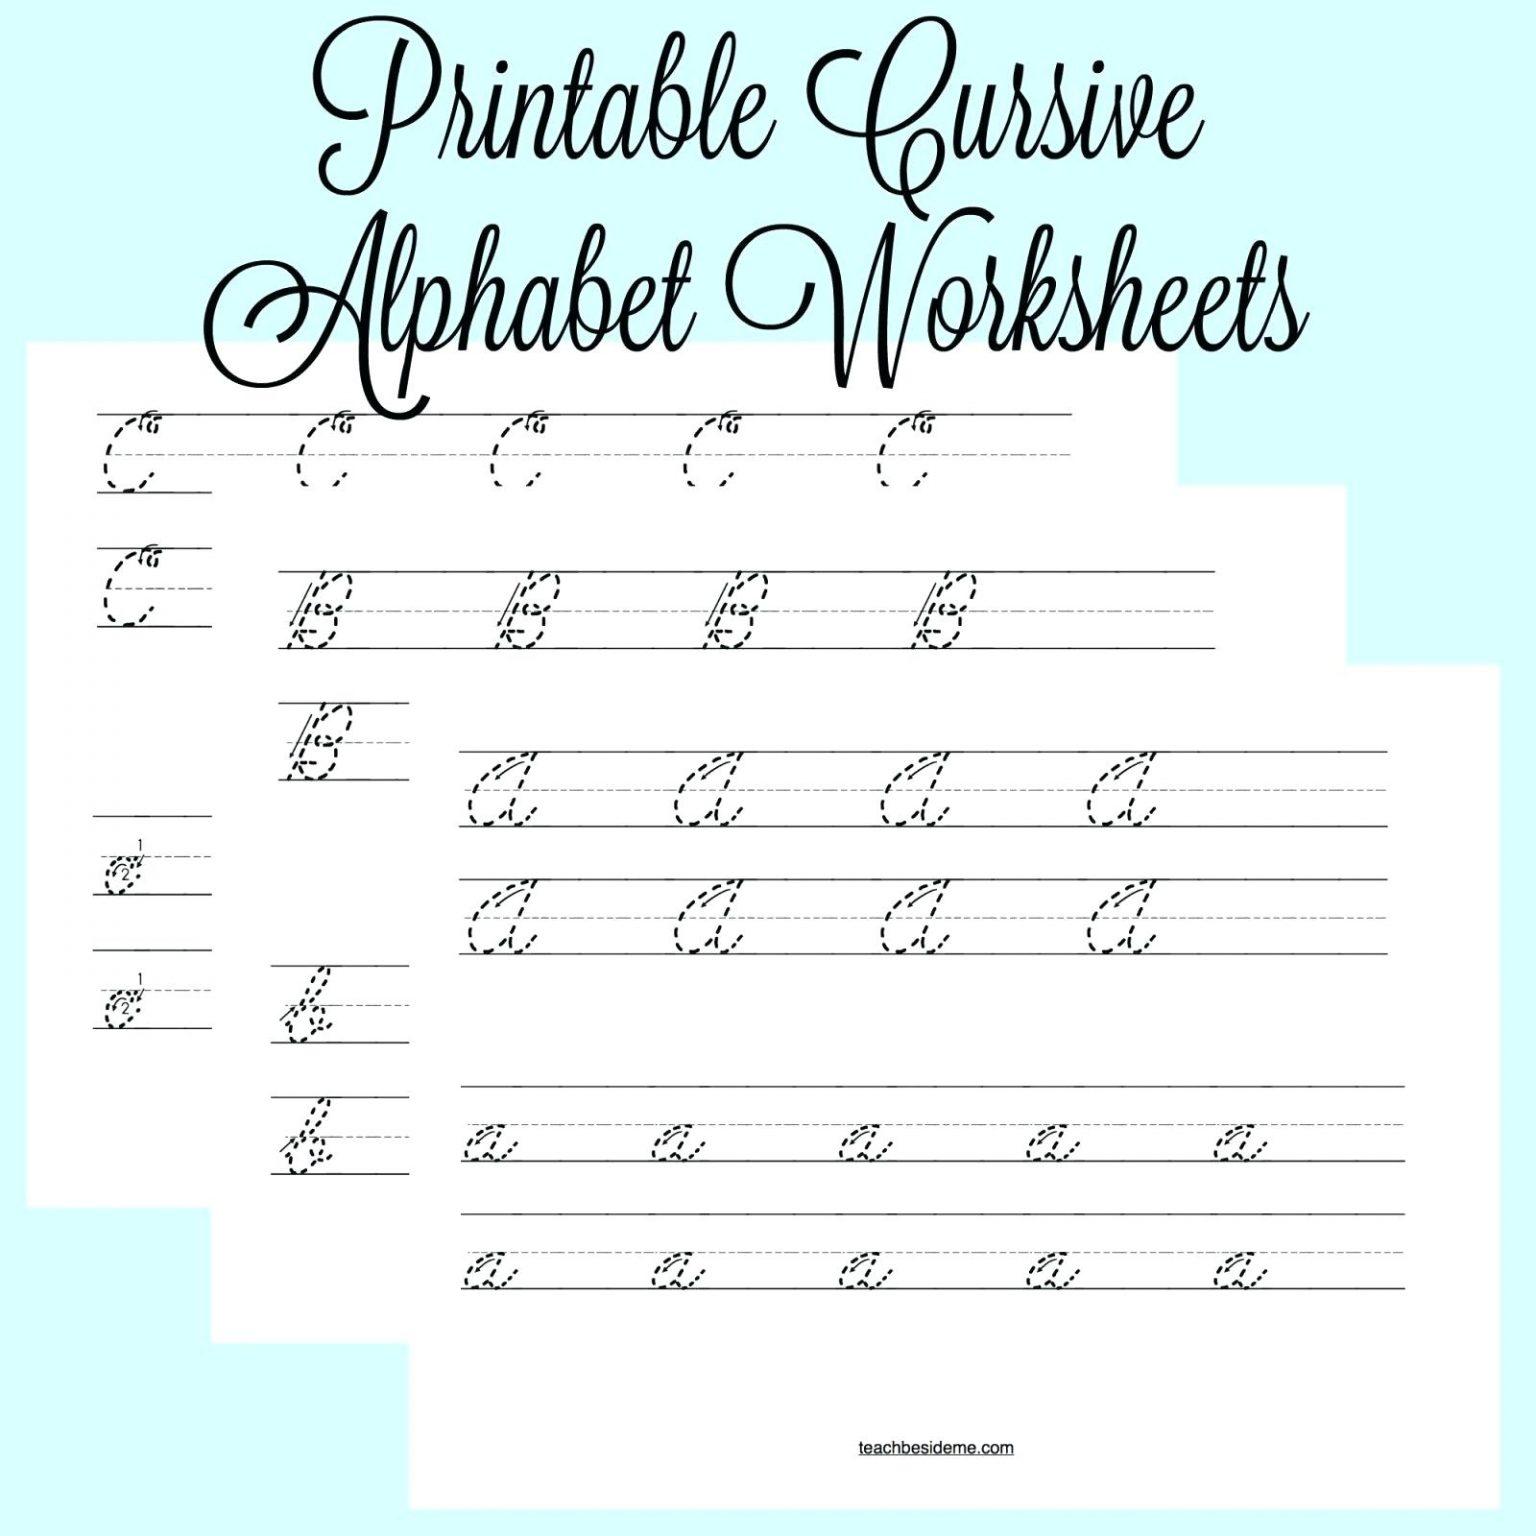 Cursive Writing Alphabets Worksheets Shoppingfoorme Club